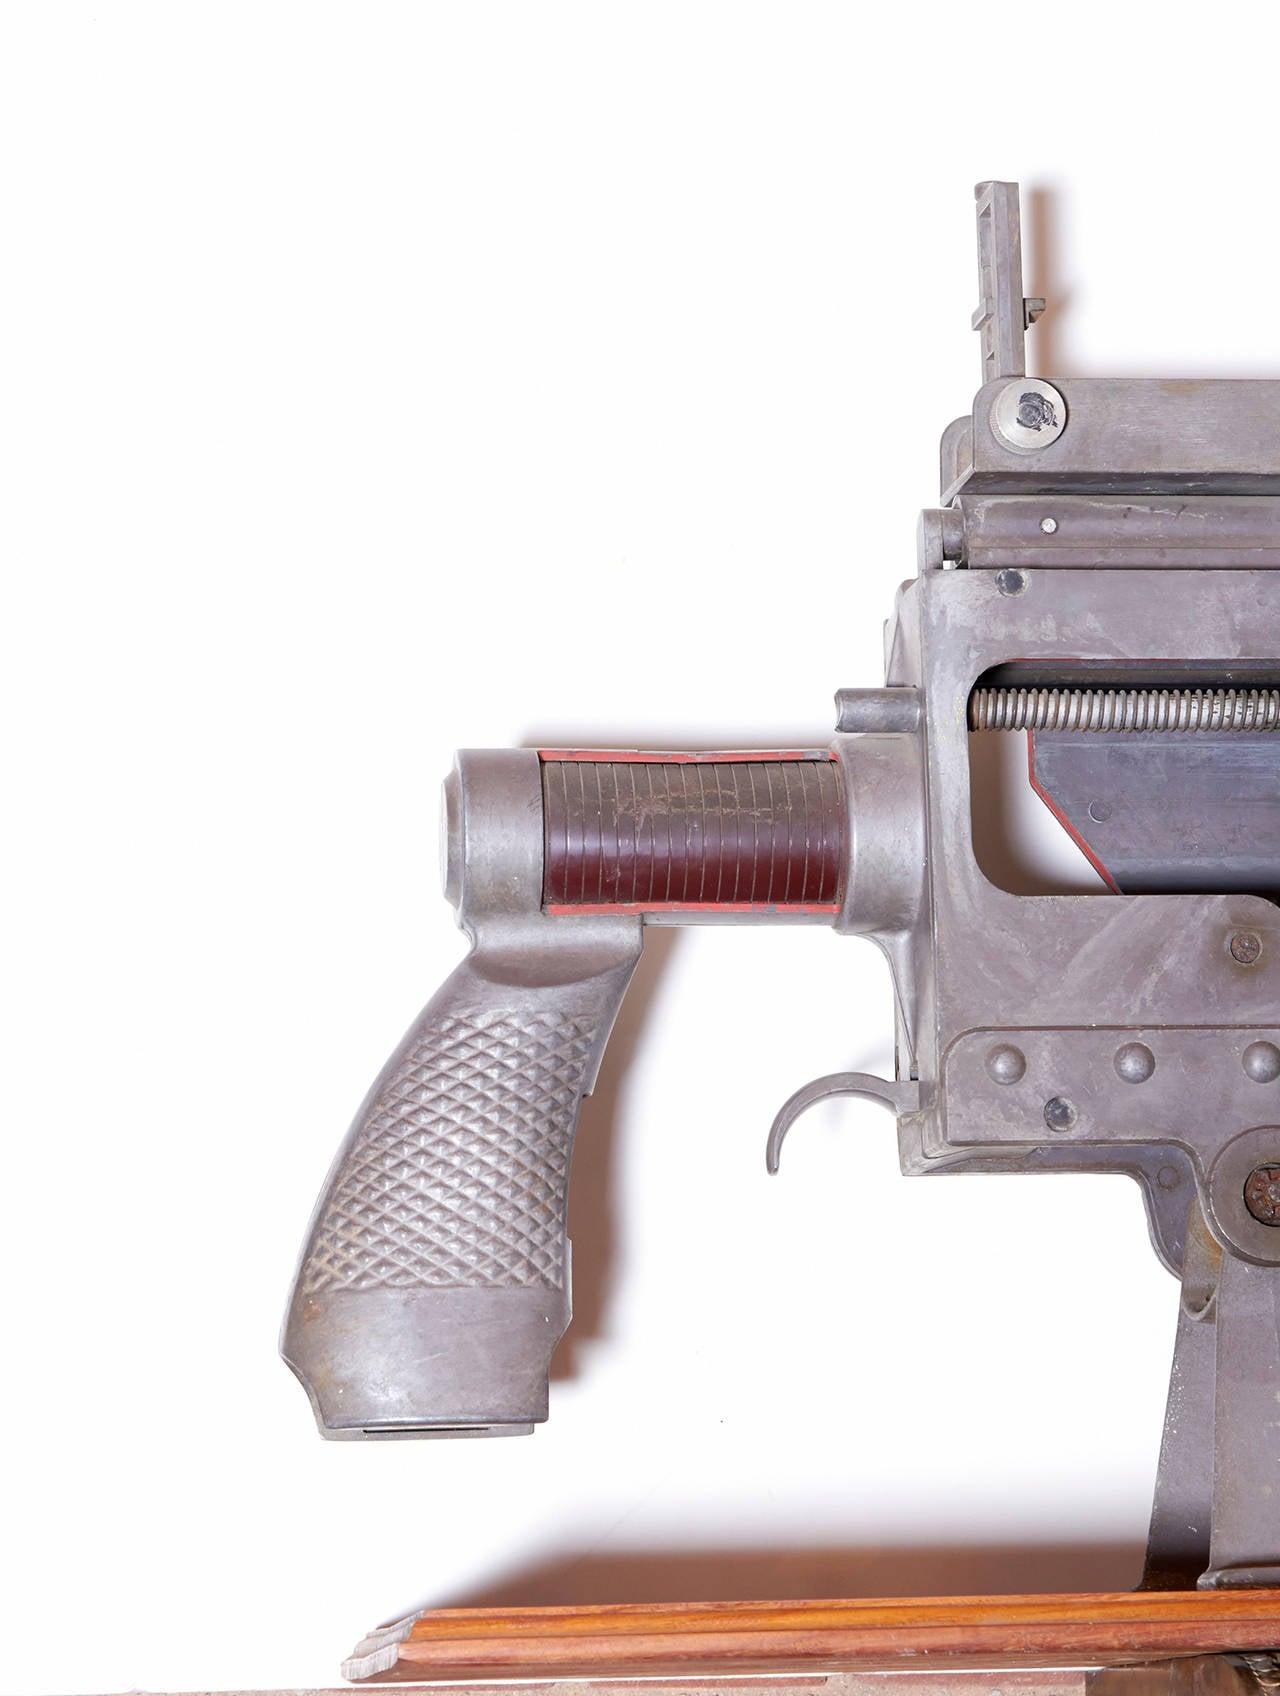 30 caliber machine gun sale